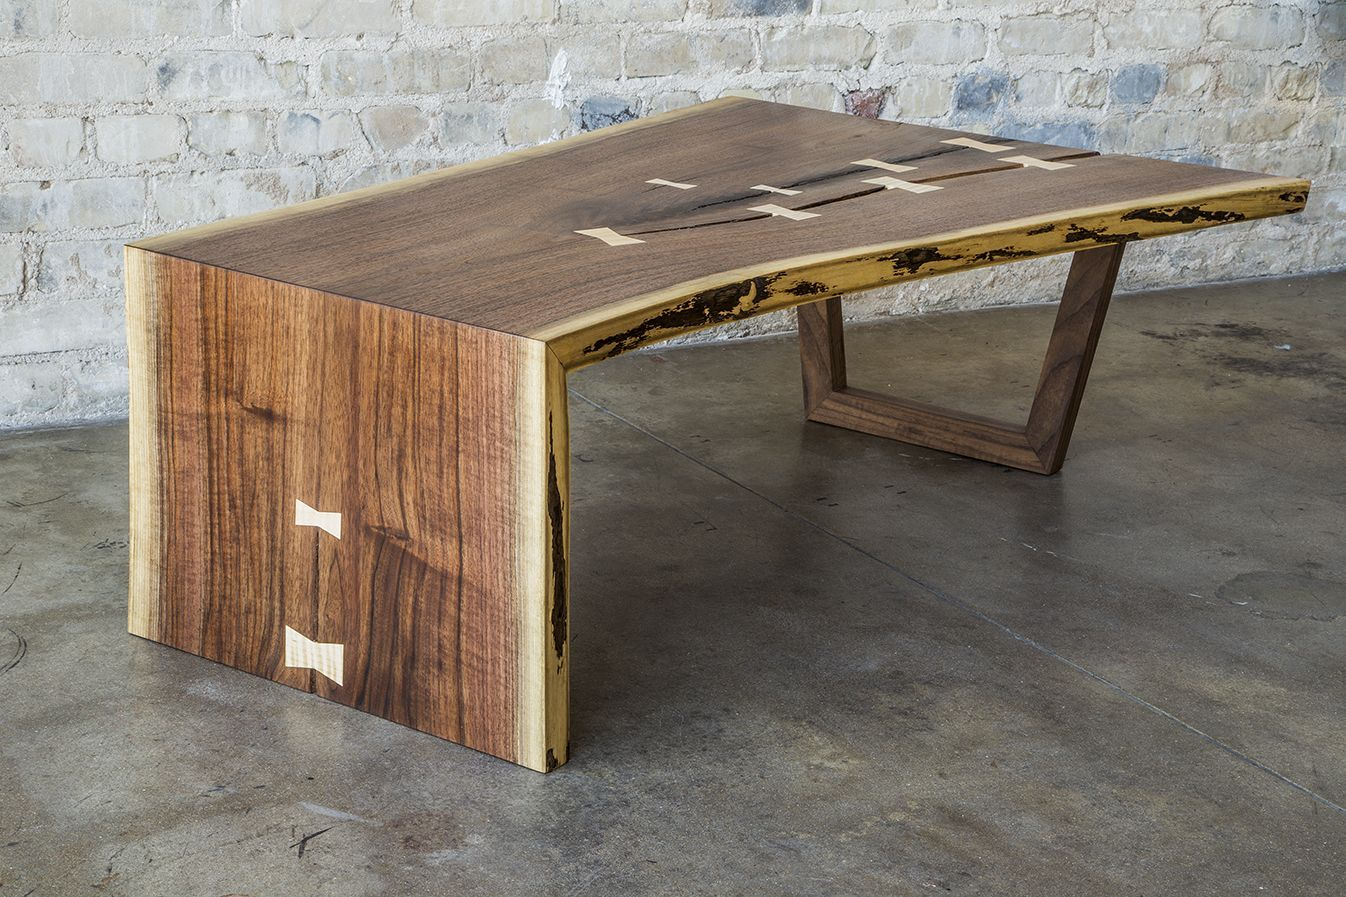 Live Edge Walnut Waterfall Coffee Table Wood Slab Table Coffee Table Wood Slab Dining Tables